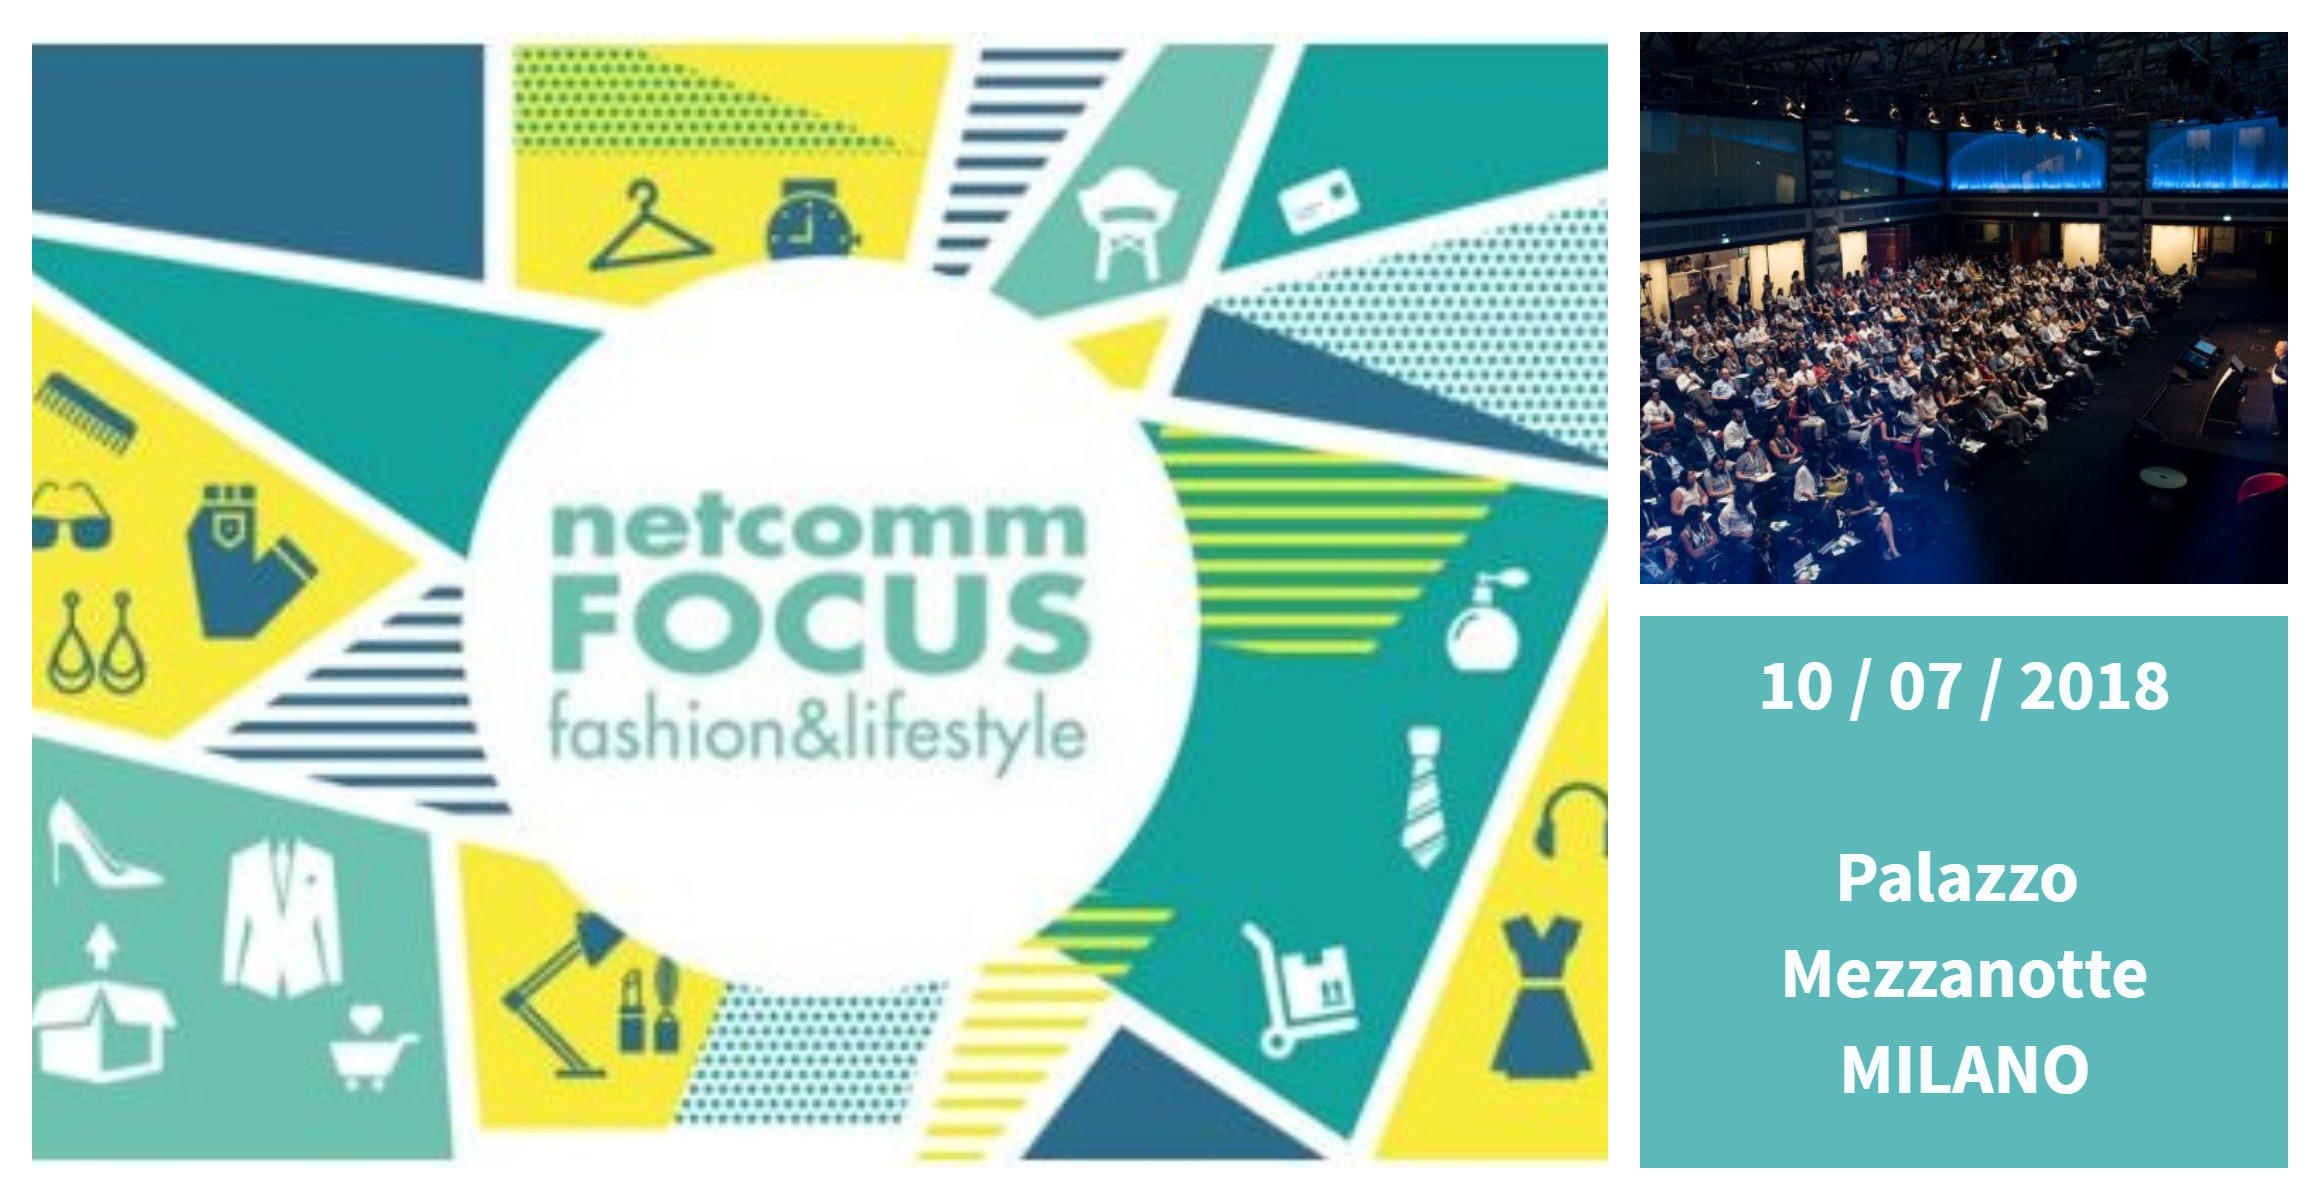 Qapla' a Netcomm Focus Fashion & Lifestyle